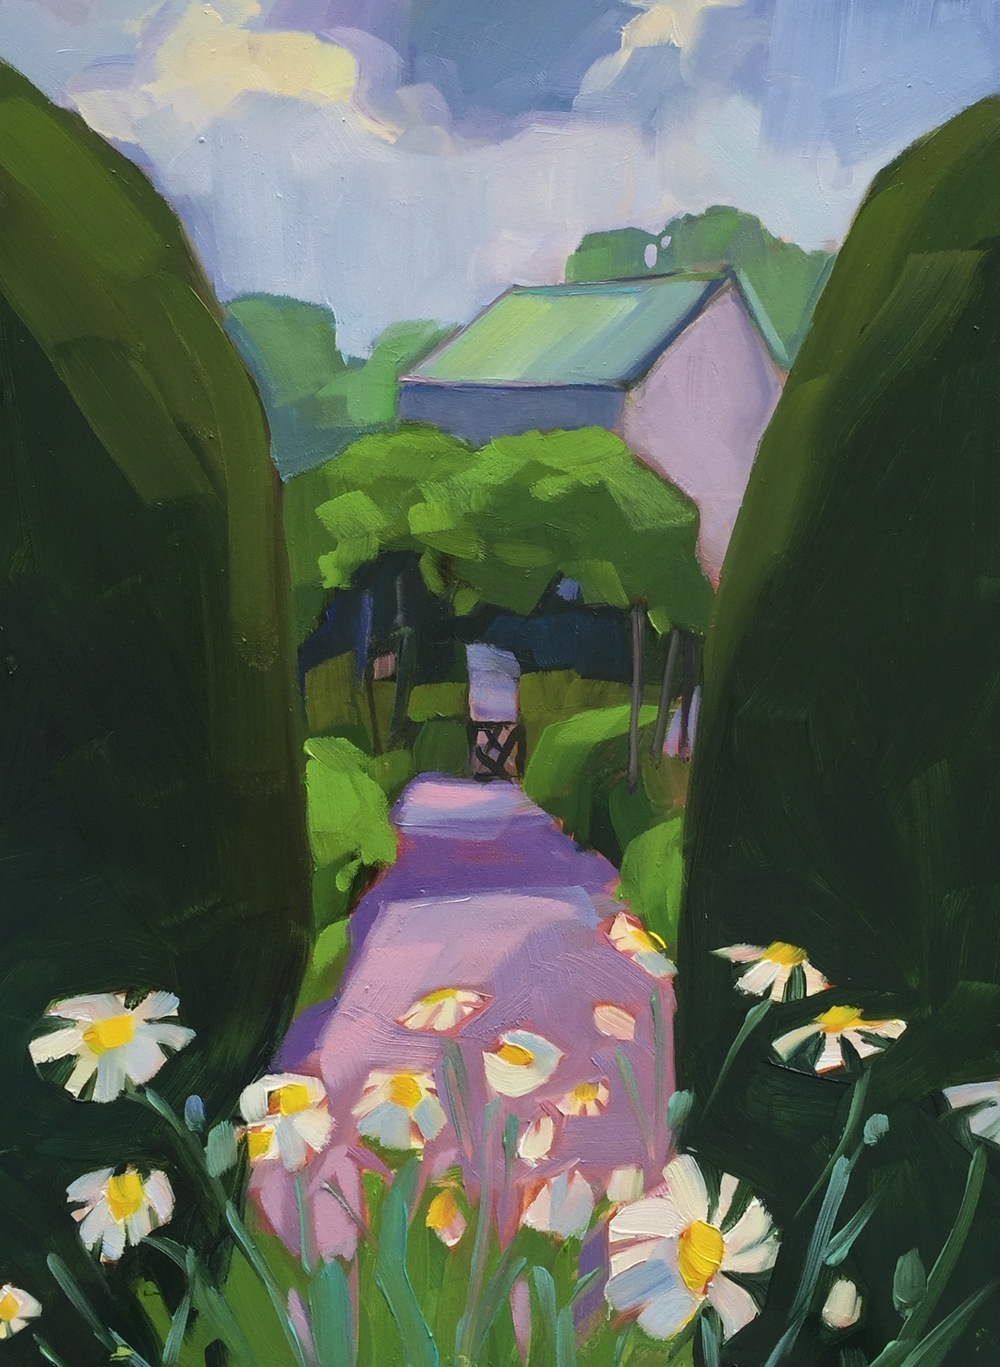 Through the Topiary